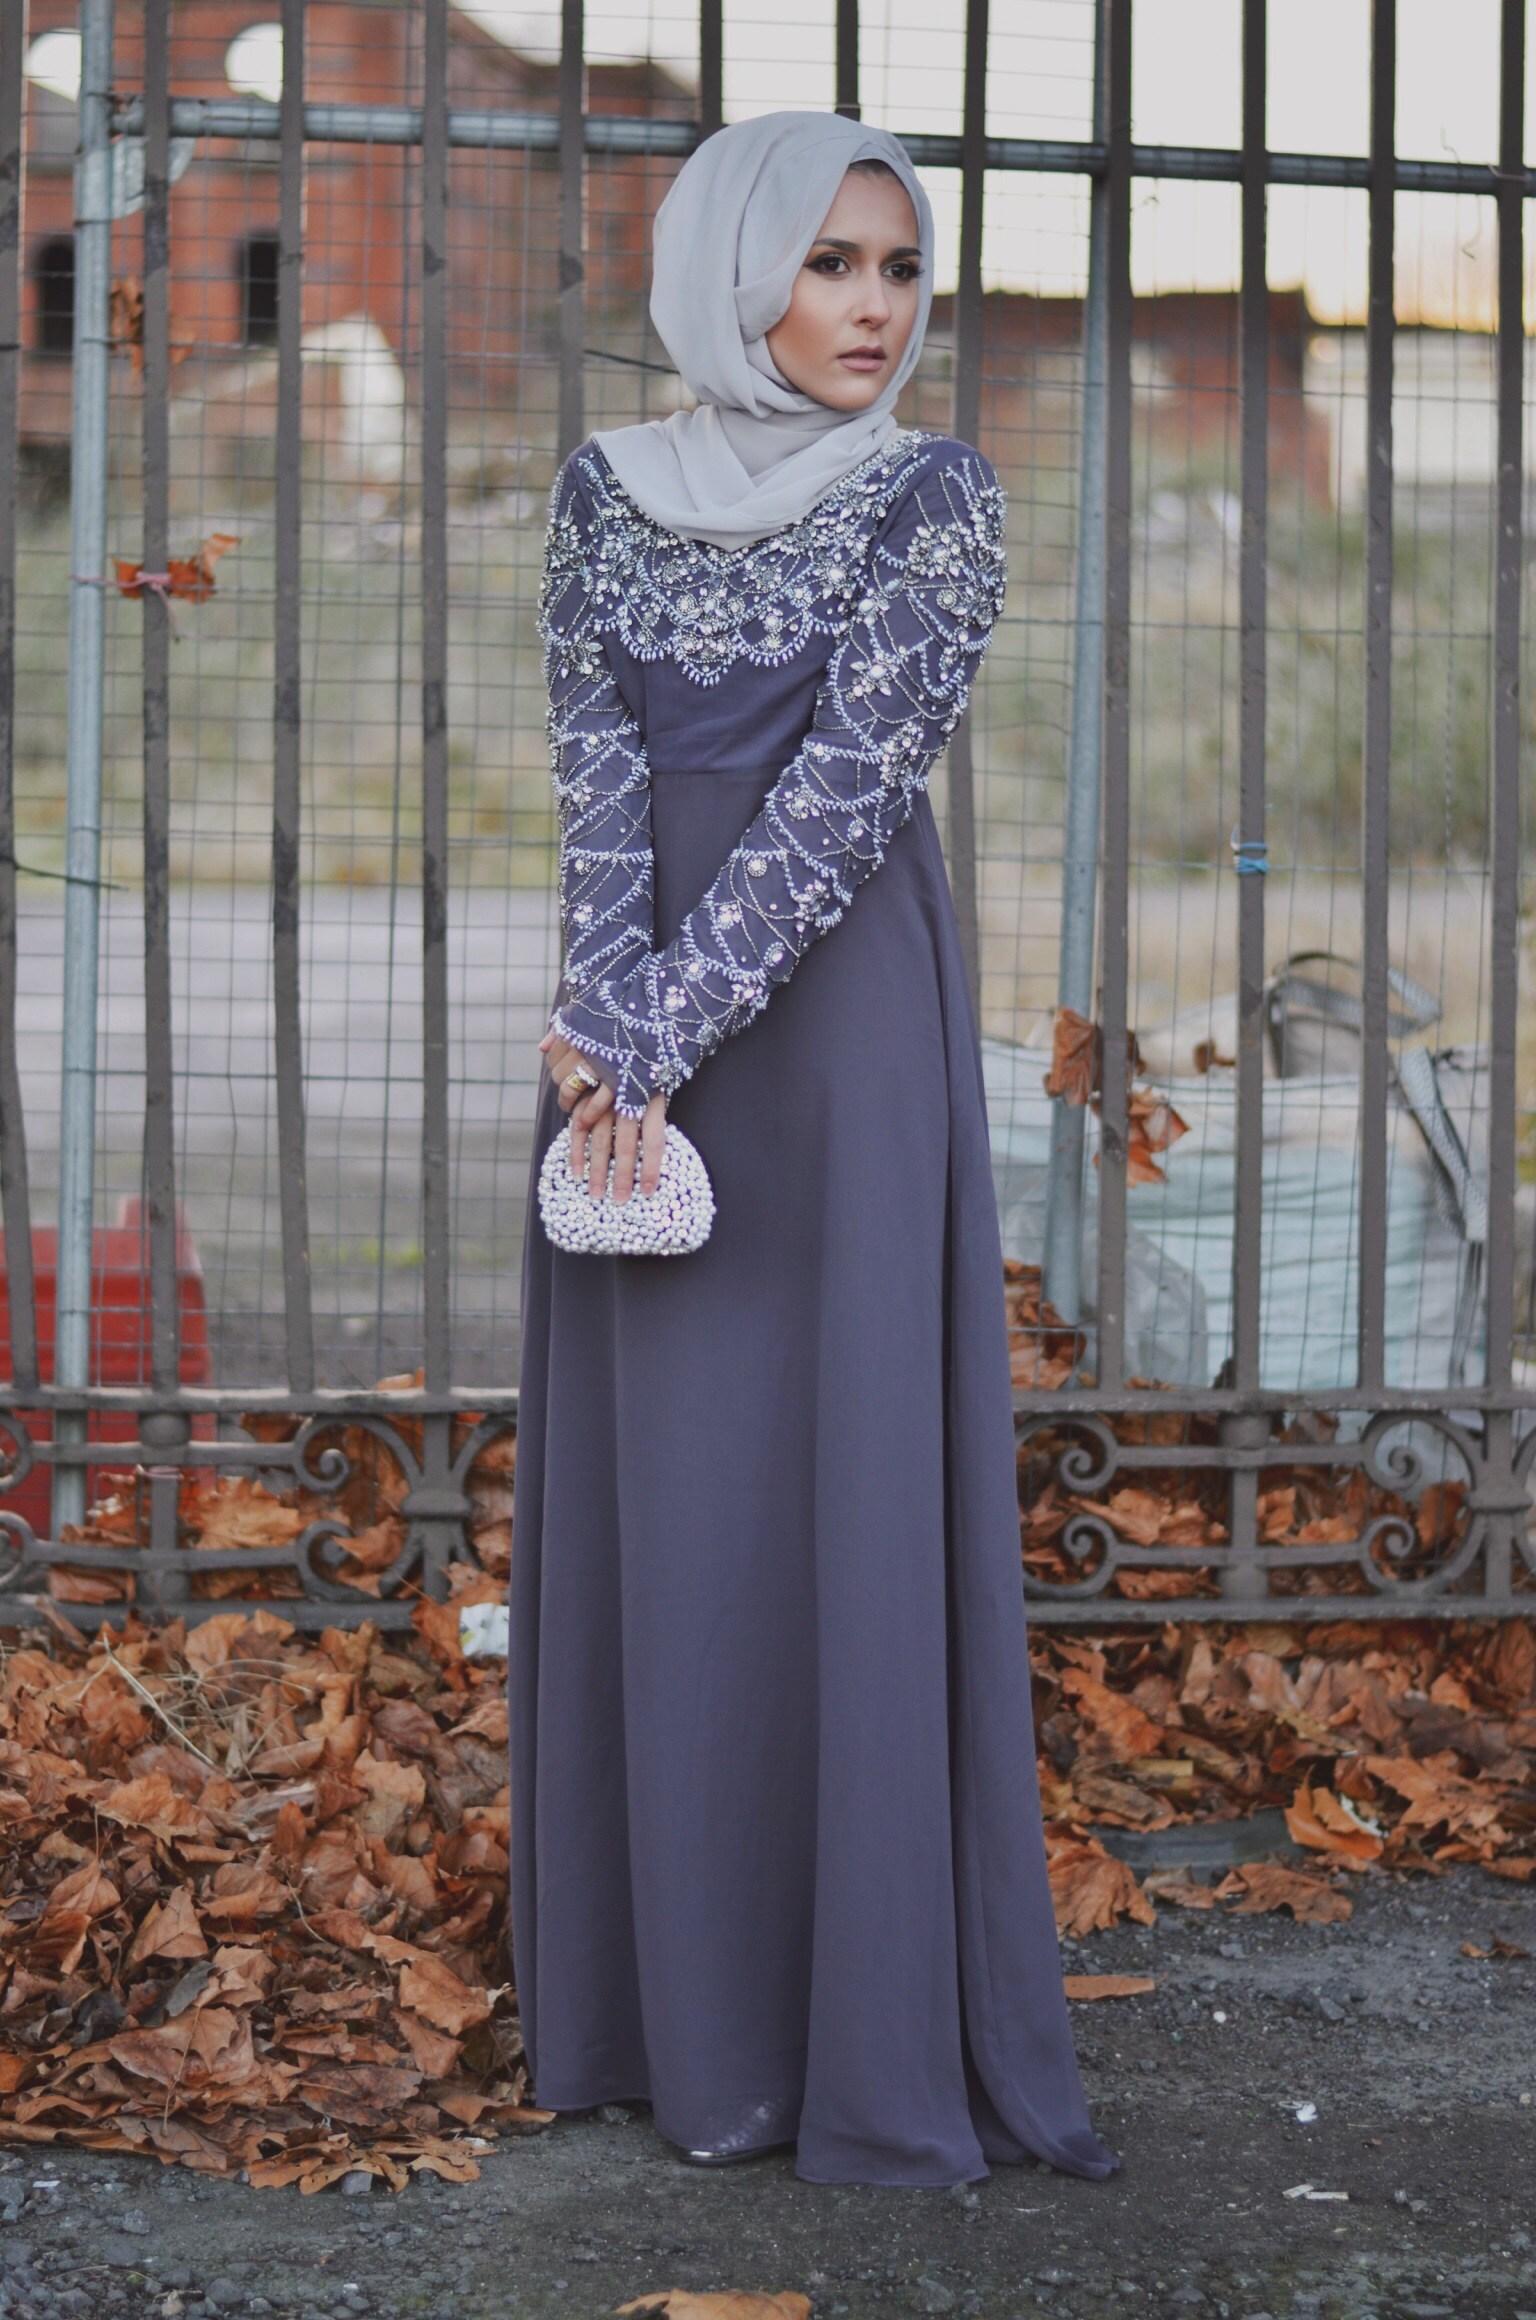 f3d8d0fcfe84d ... باللون الرمادي يظهر فستان المحجبات التركي ...